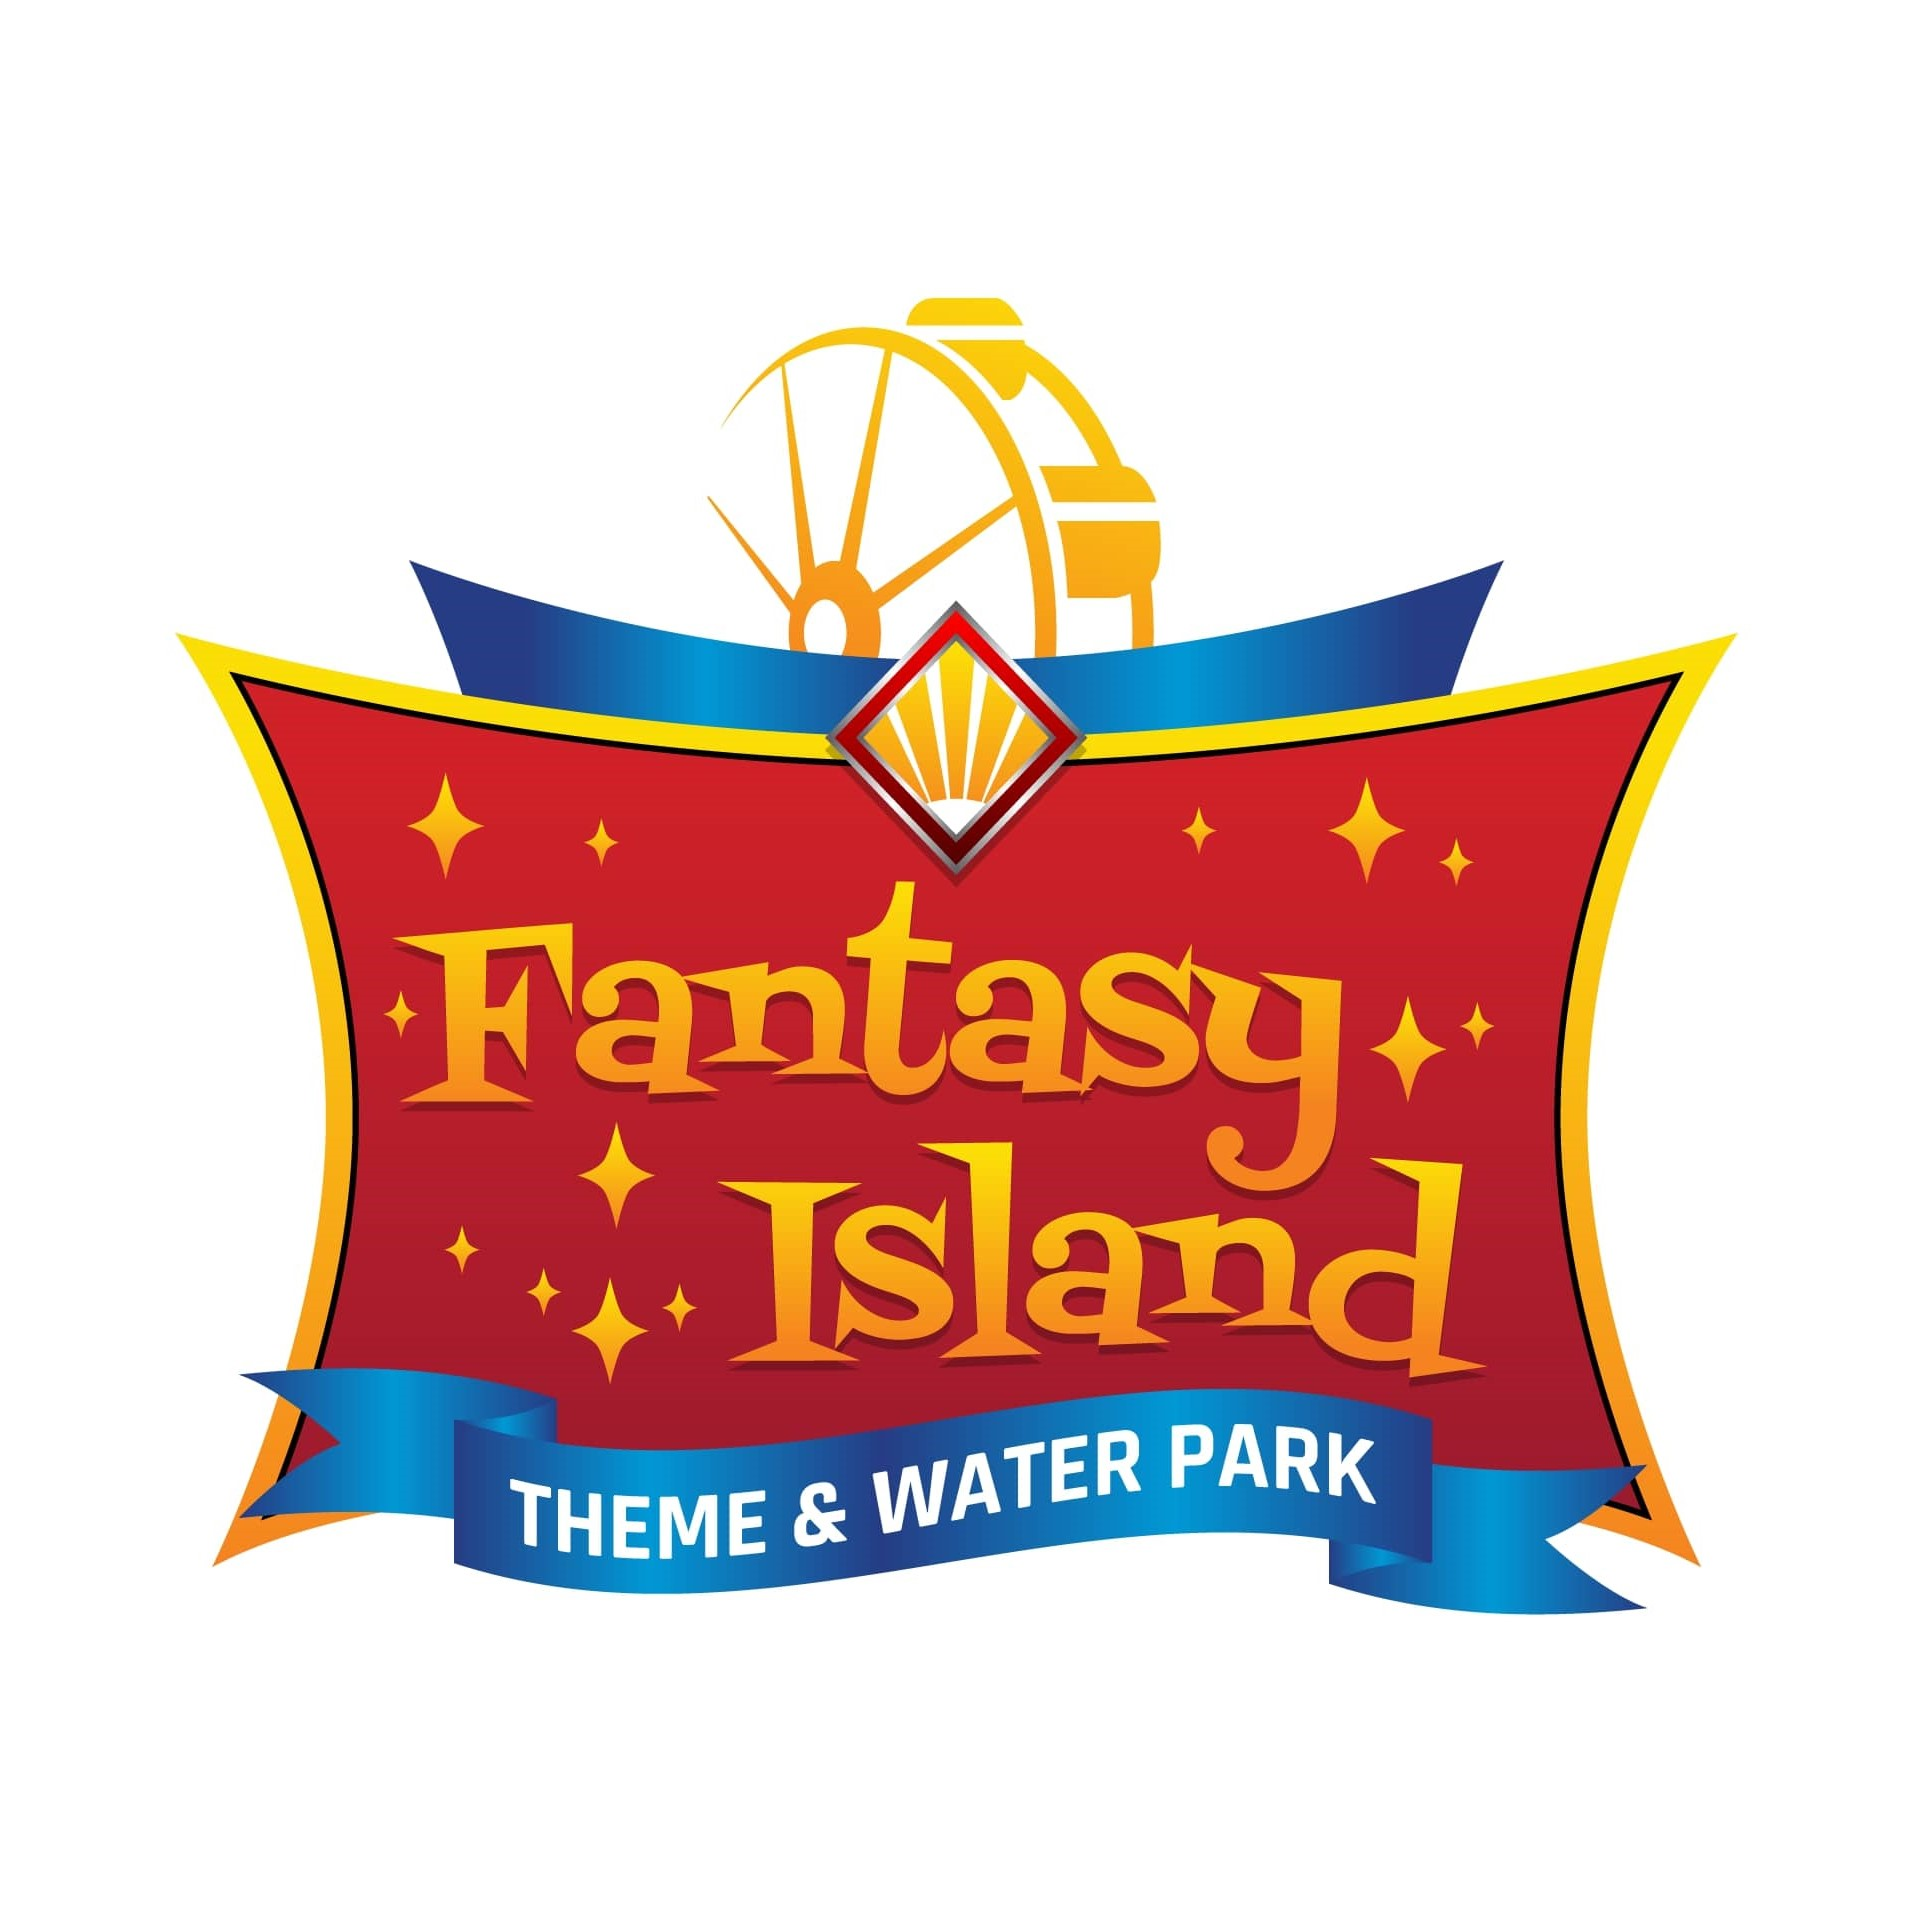 Fantasy Island Theme & Water Park logo